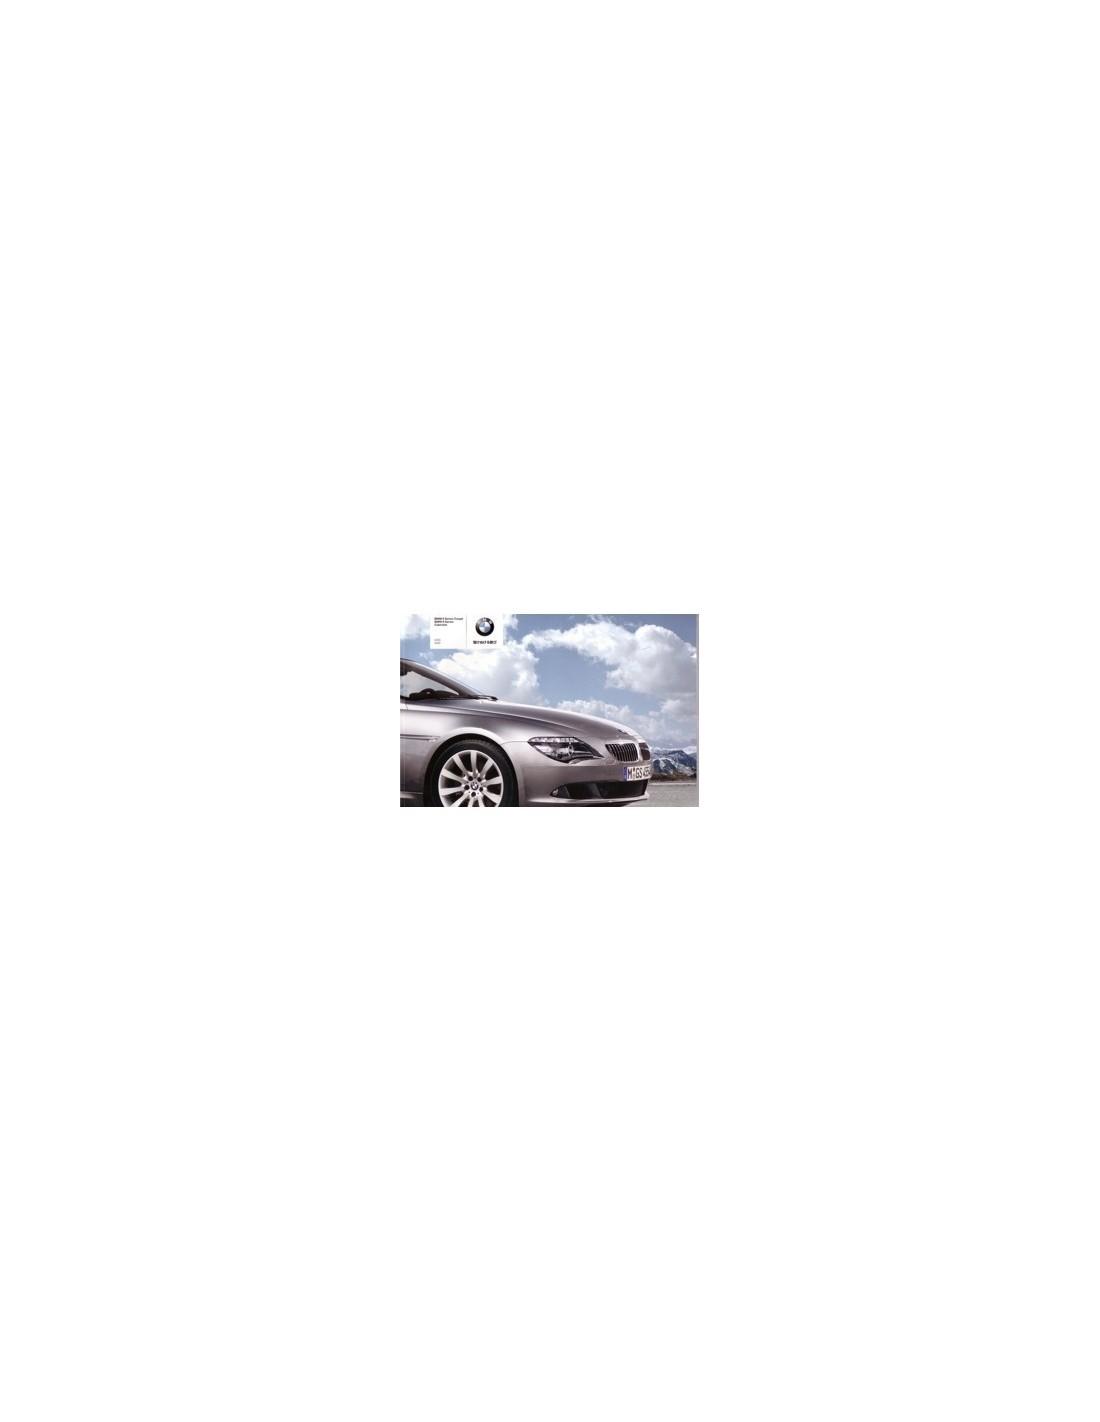 Bmw Z3 Brochure: 2008 BMW 6 SERIES COUPE CABRIOLET BROCHURE JAPANS